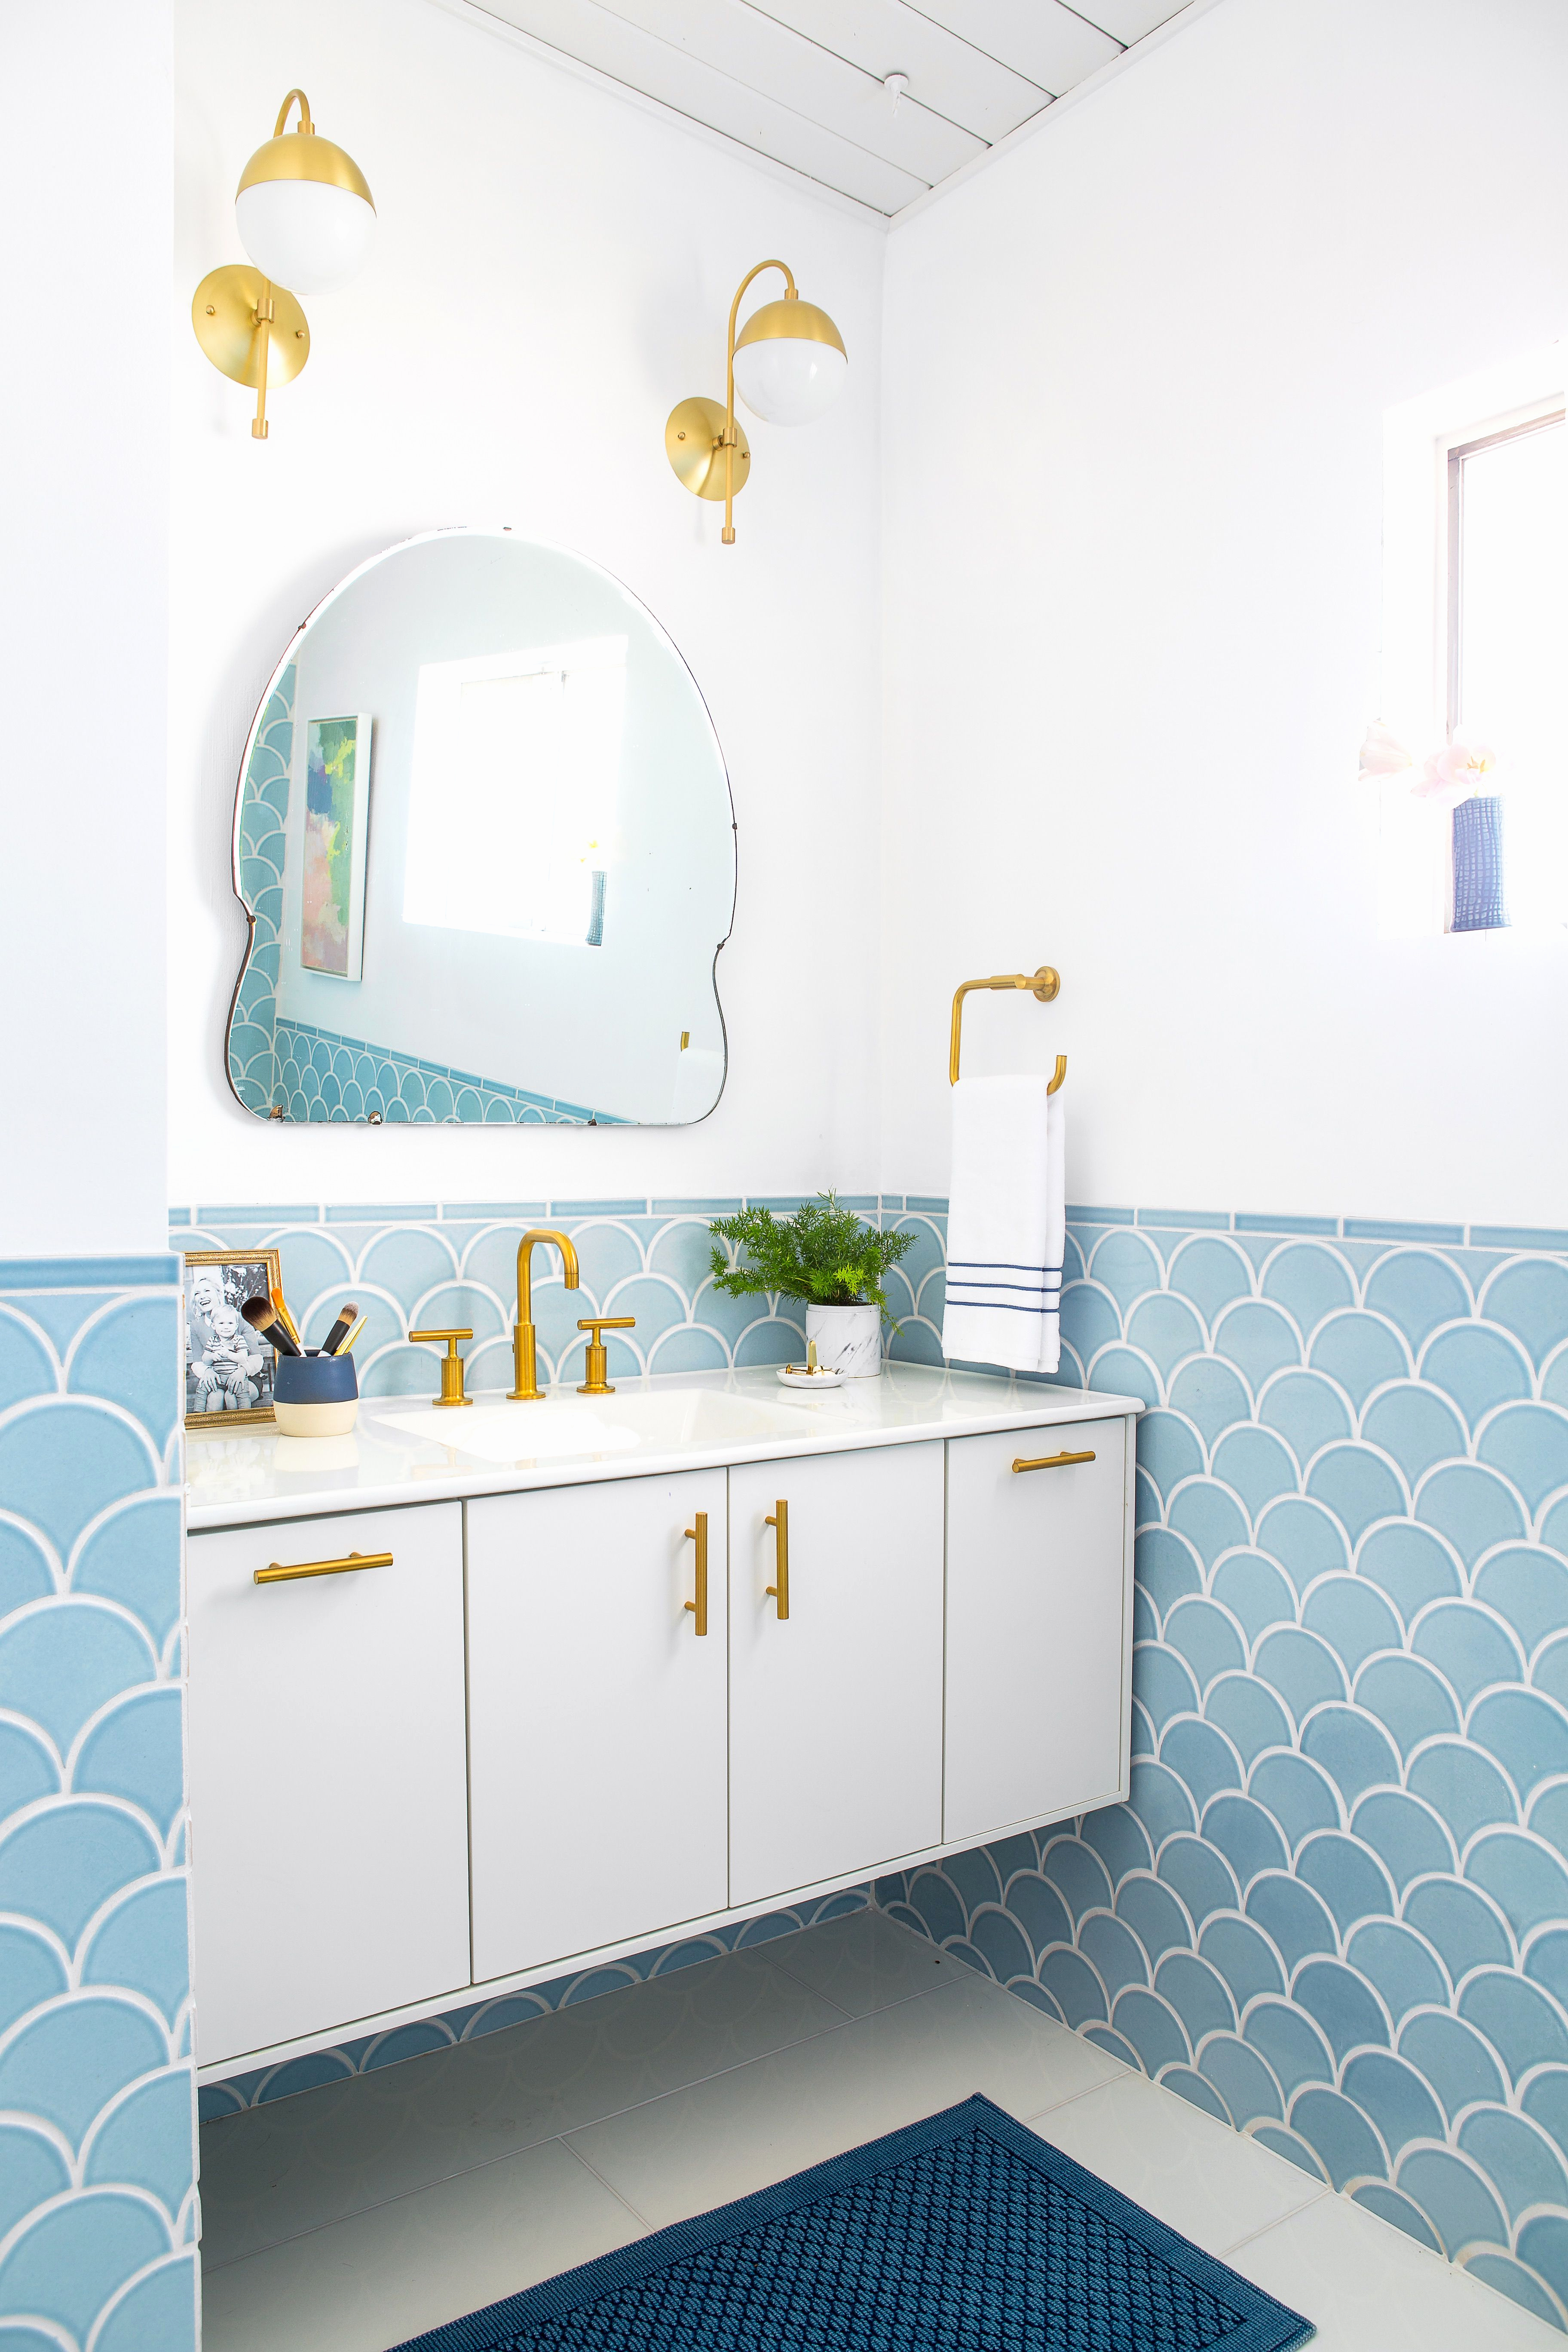 Small Bathroom Tiles Design Philippines Image Of Bathroom And Closet